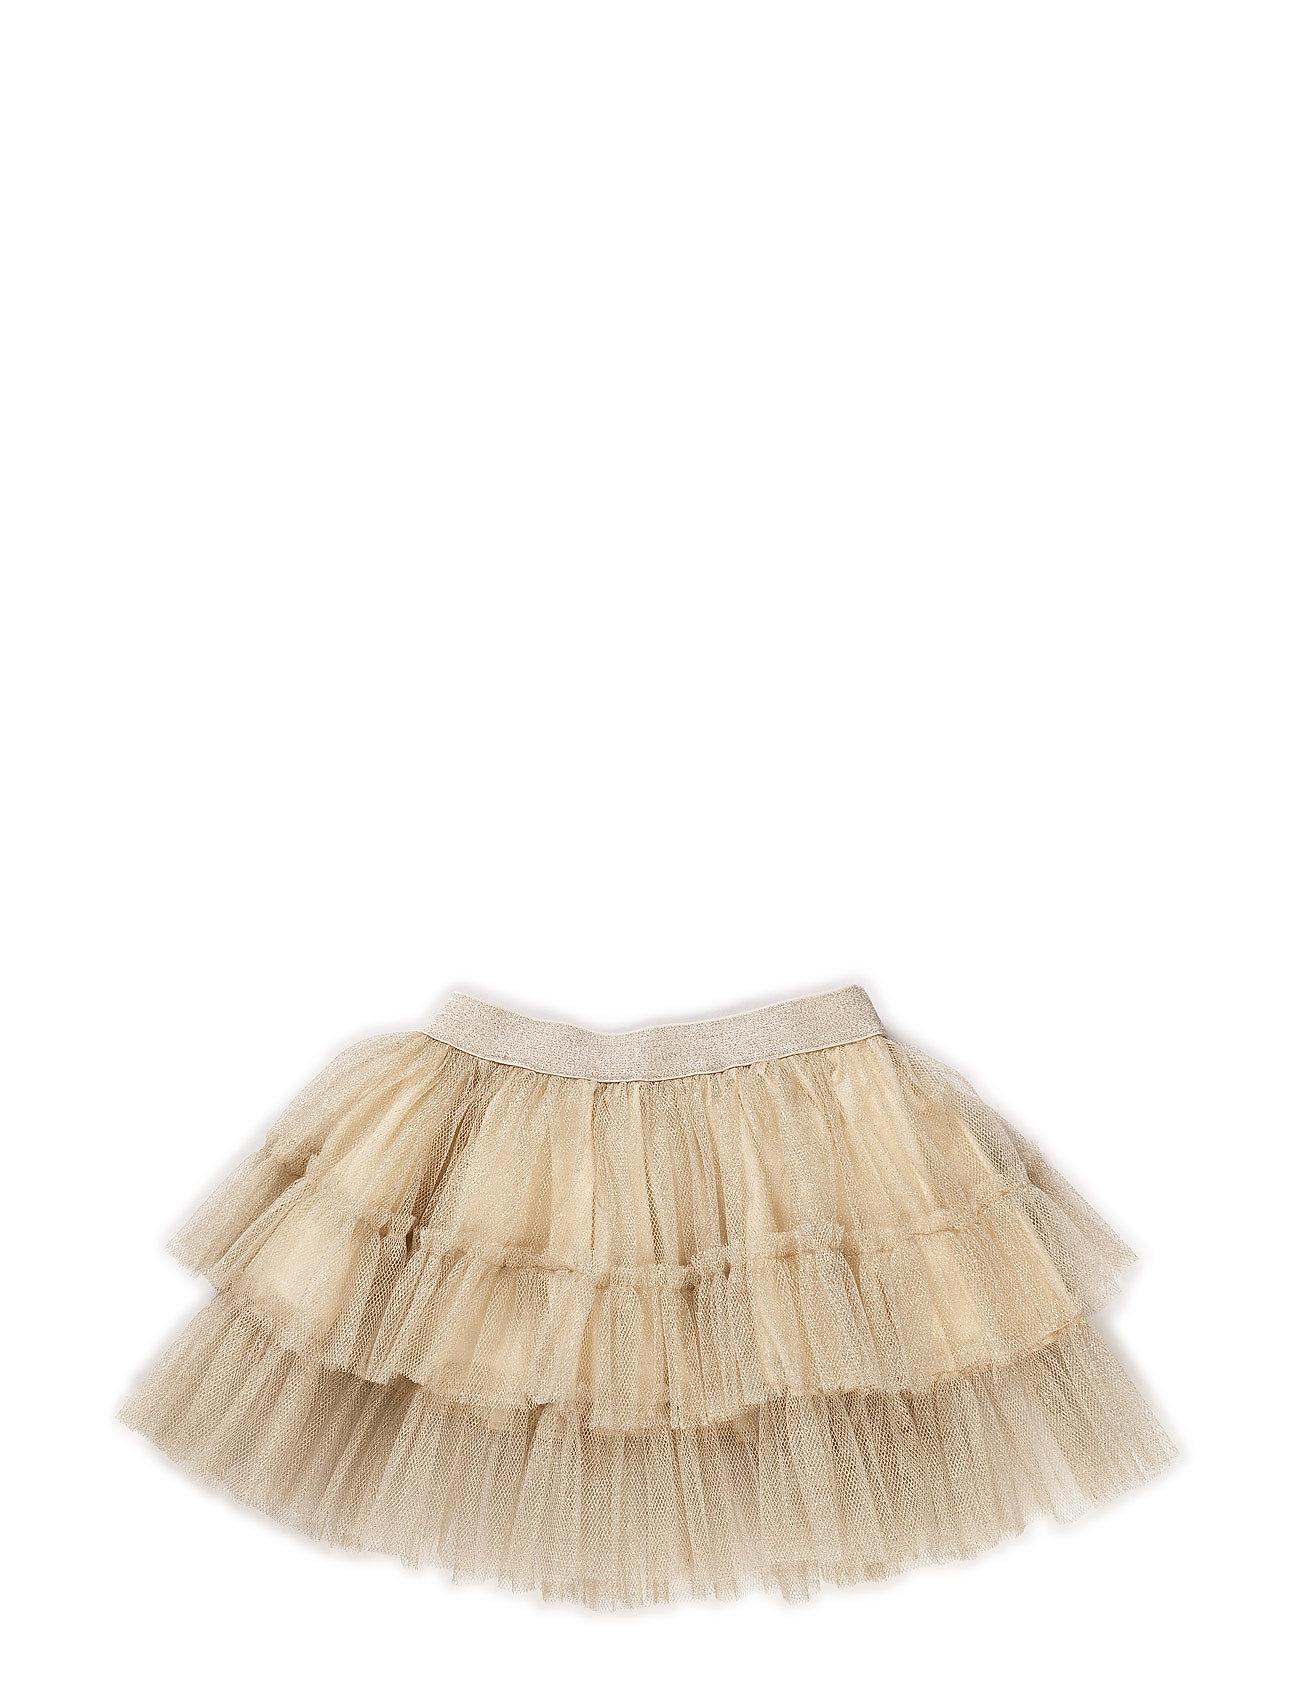 MarMar Cph Dancer Tutu Skirt - GOLD